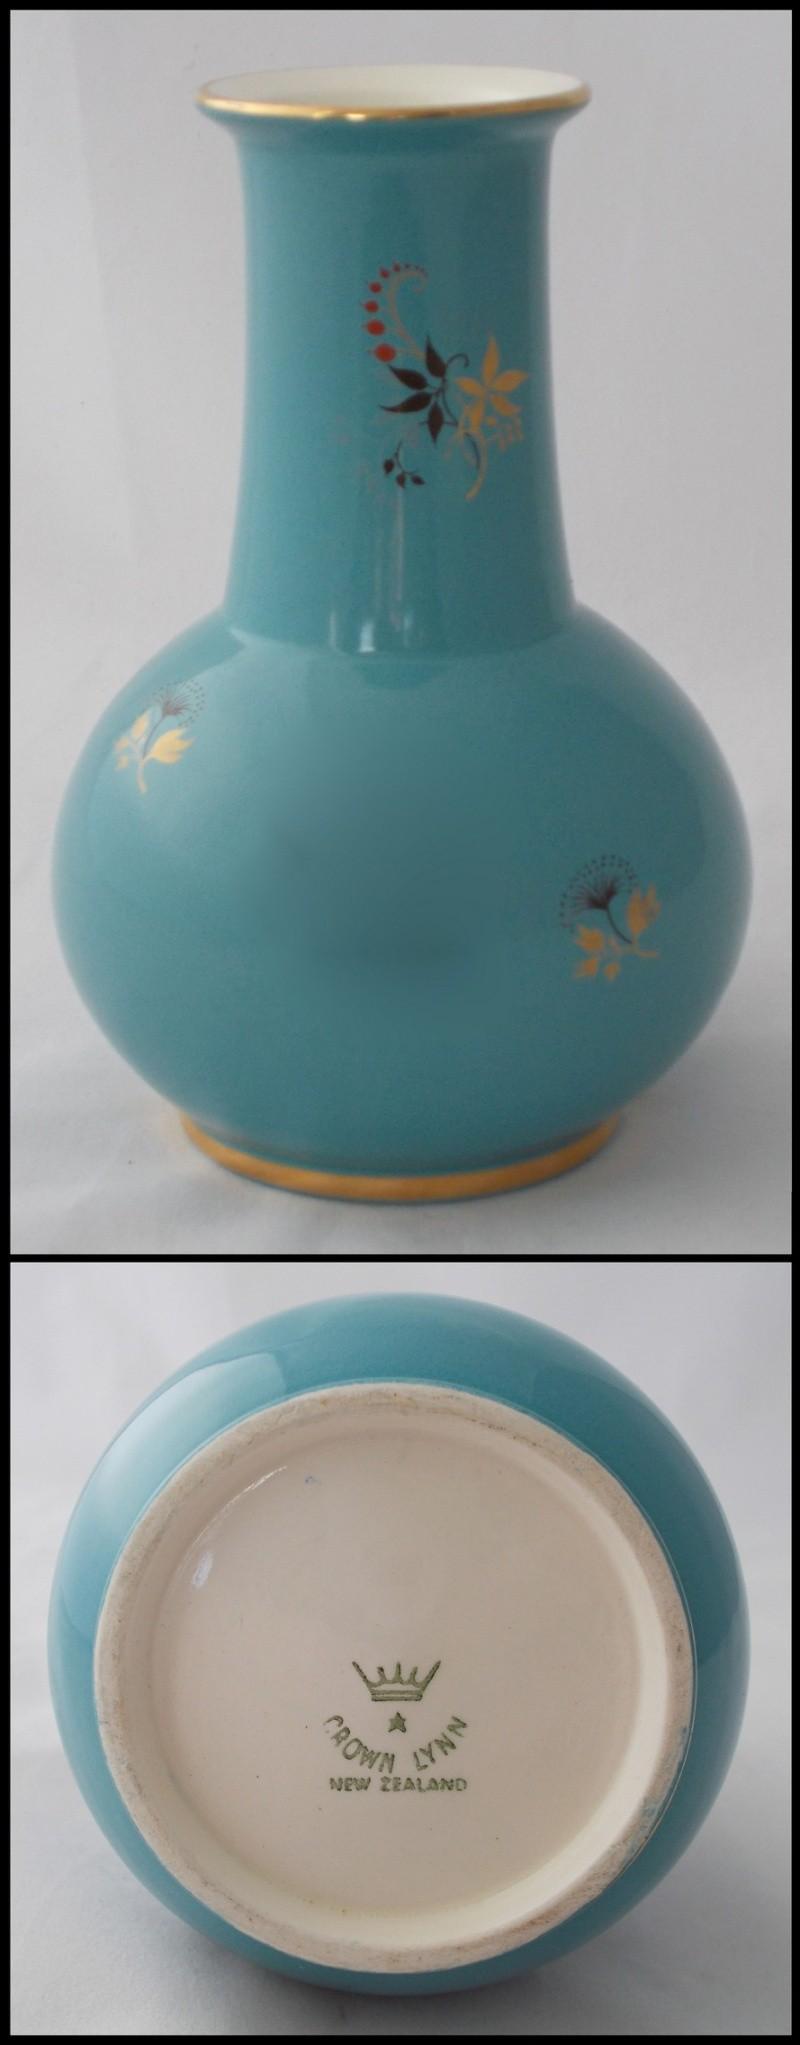 Blue Crown Lynn hand potted Steenstra? Steens10